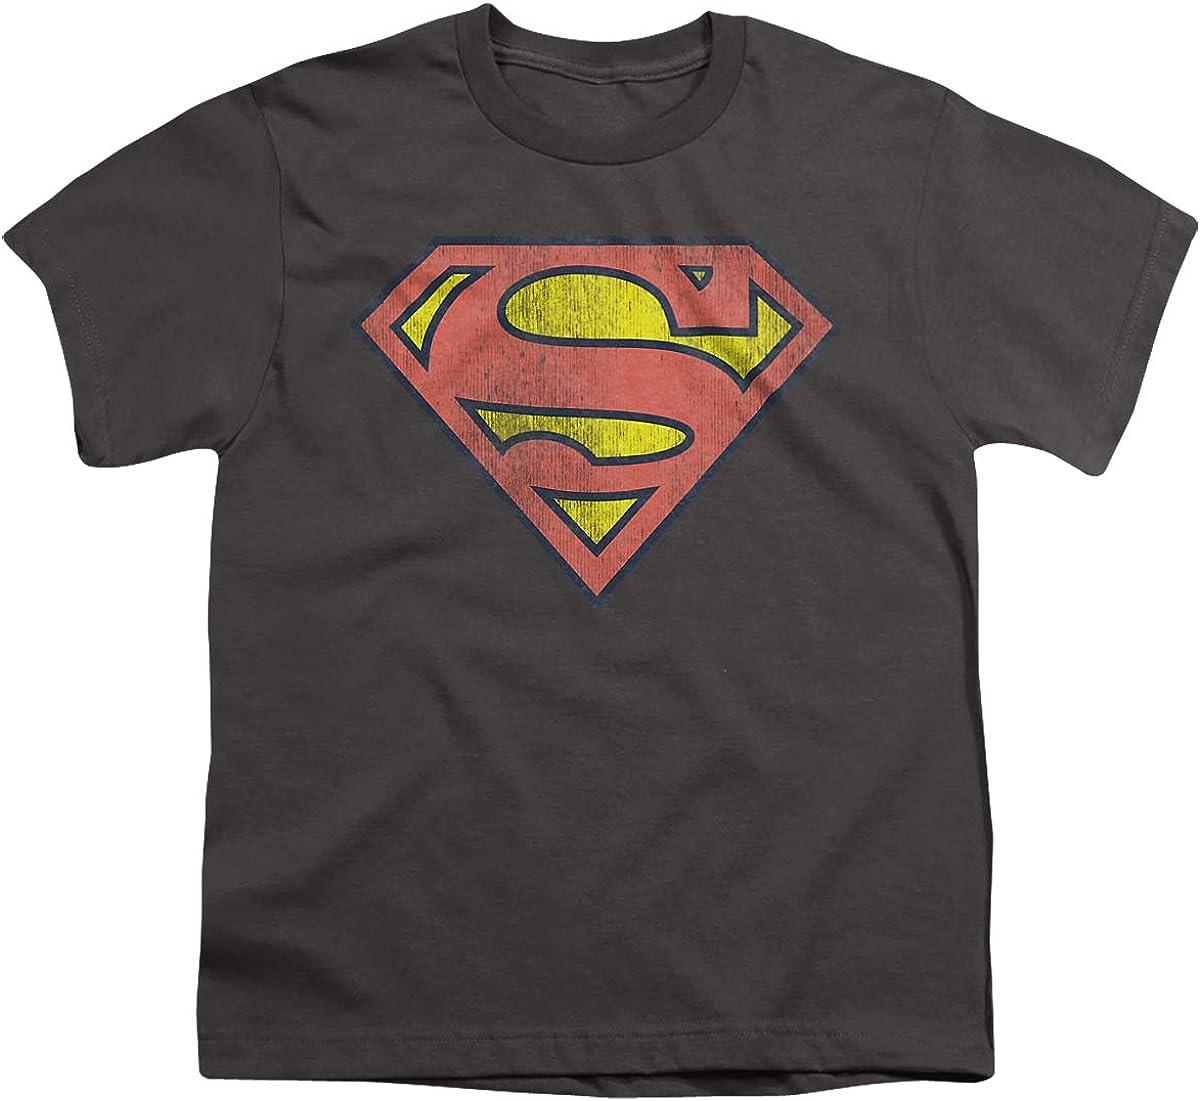 DC Retro Supes Logo Distressed Unisex Youth T Shirt, Charcoal, Medium